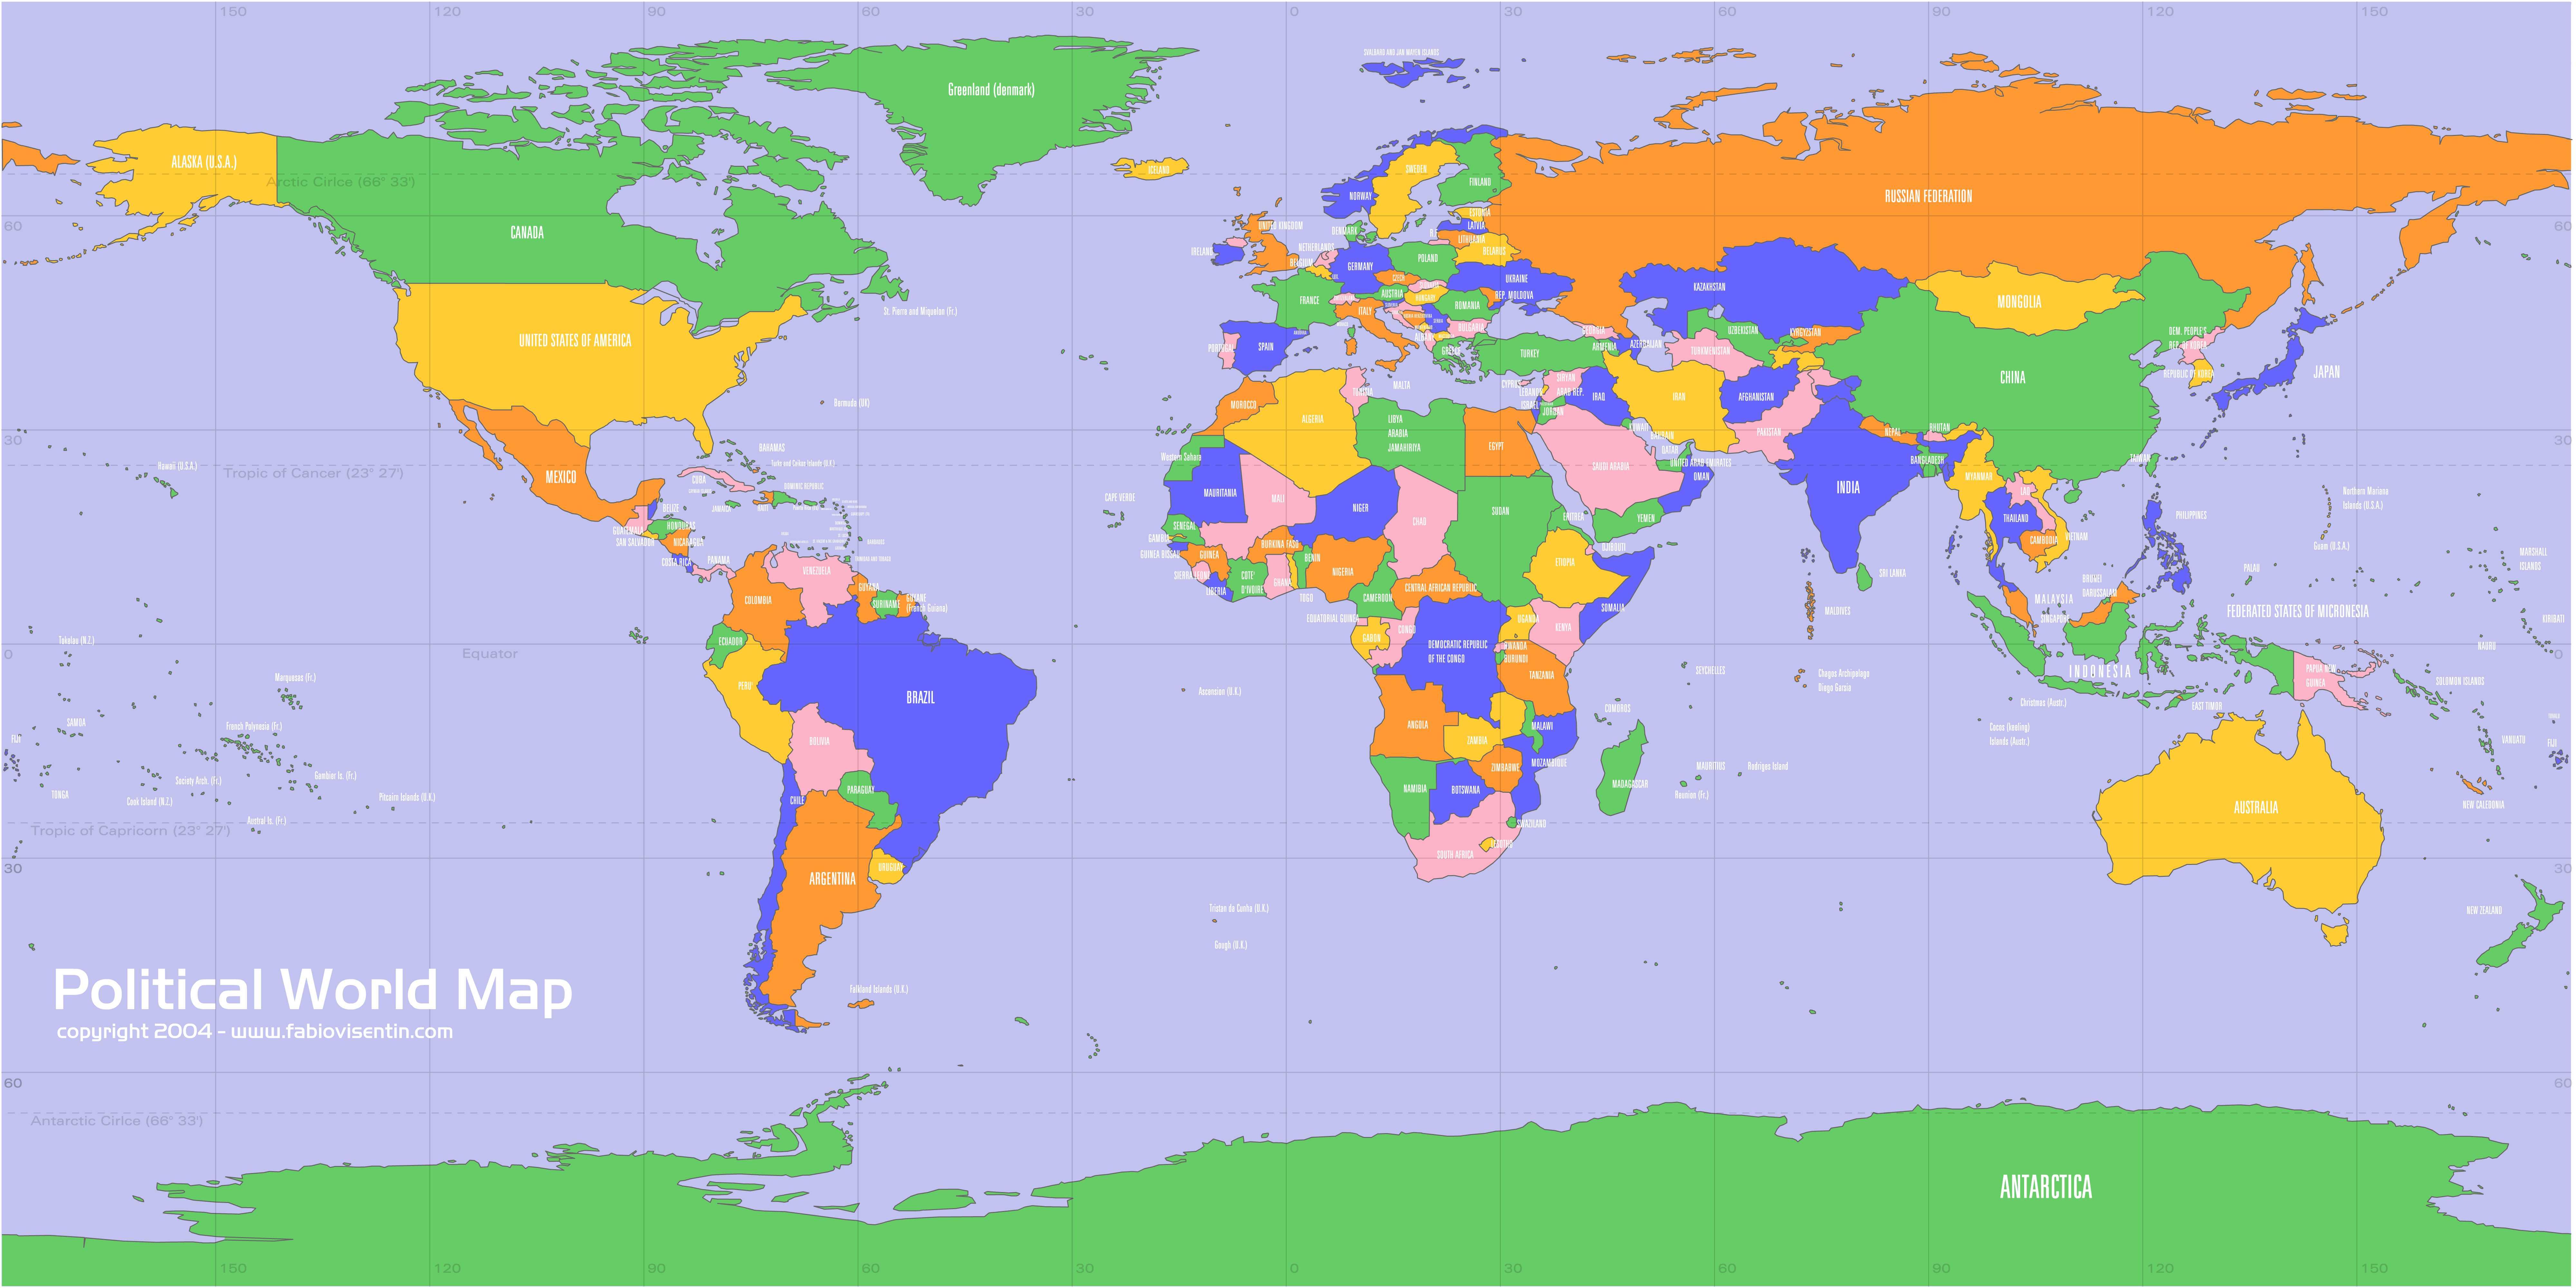 political_world_map